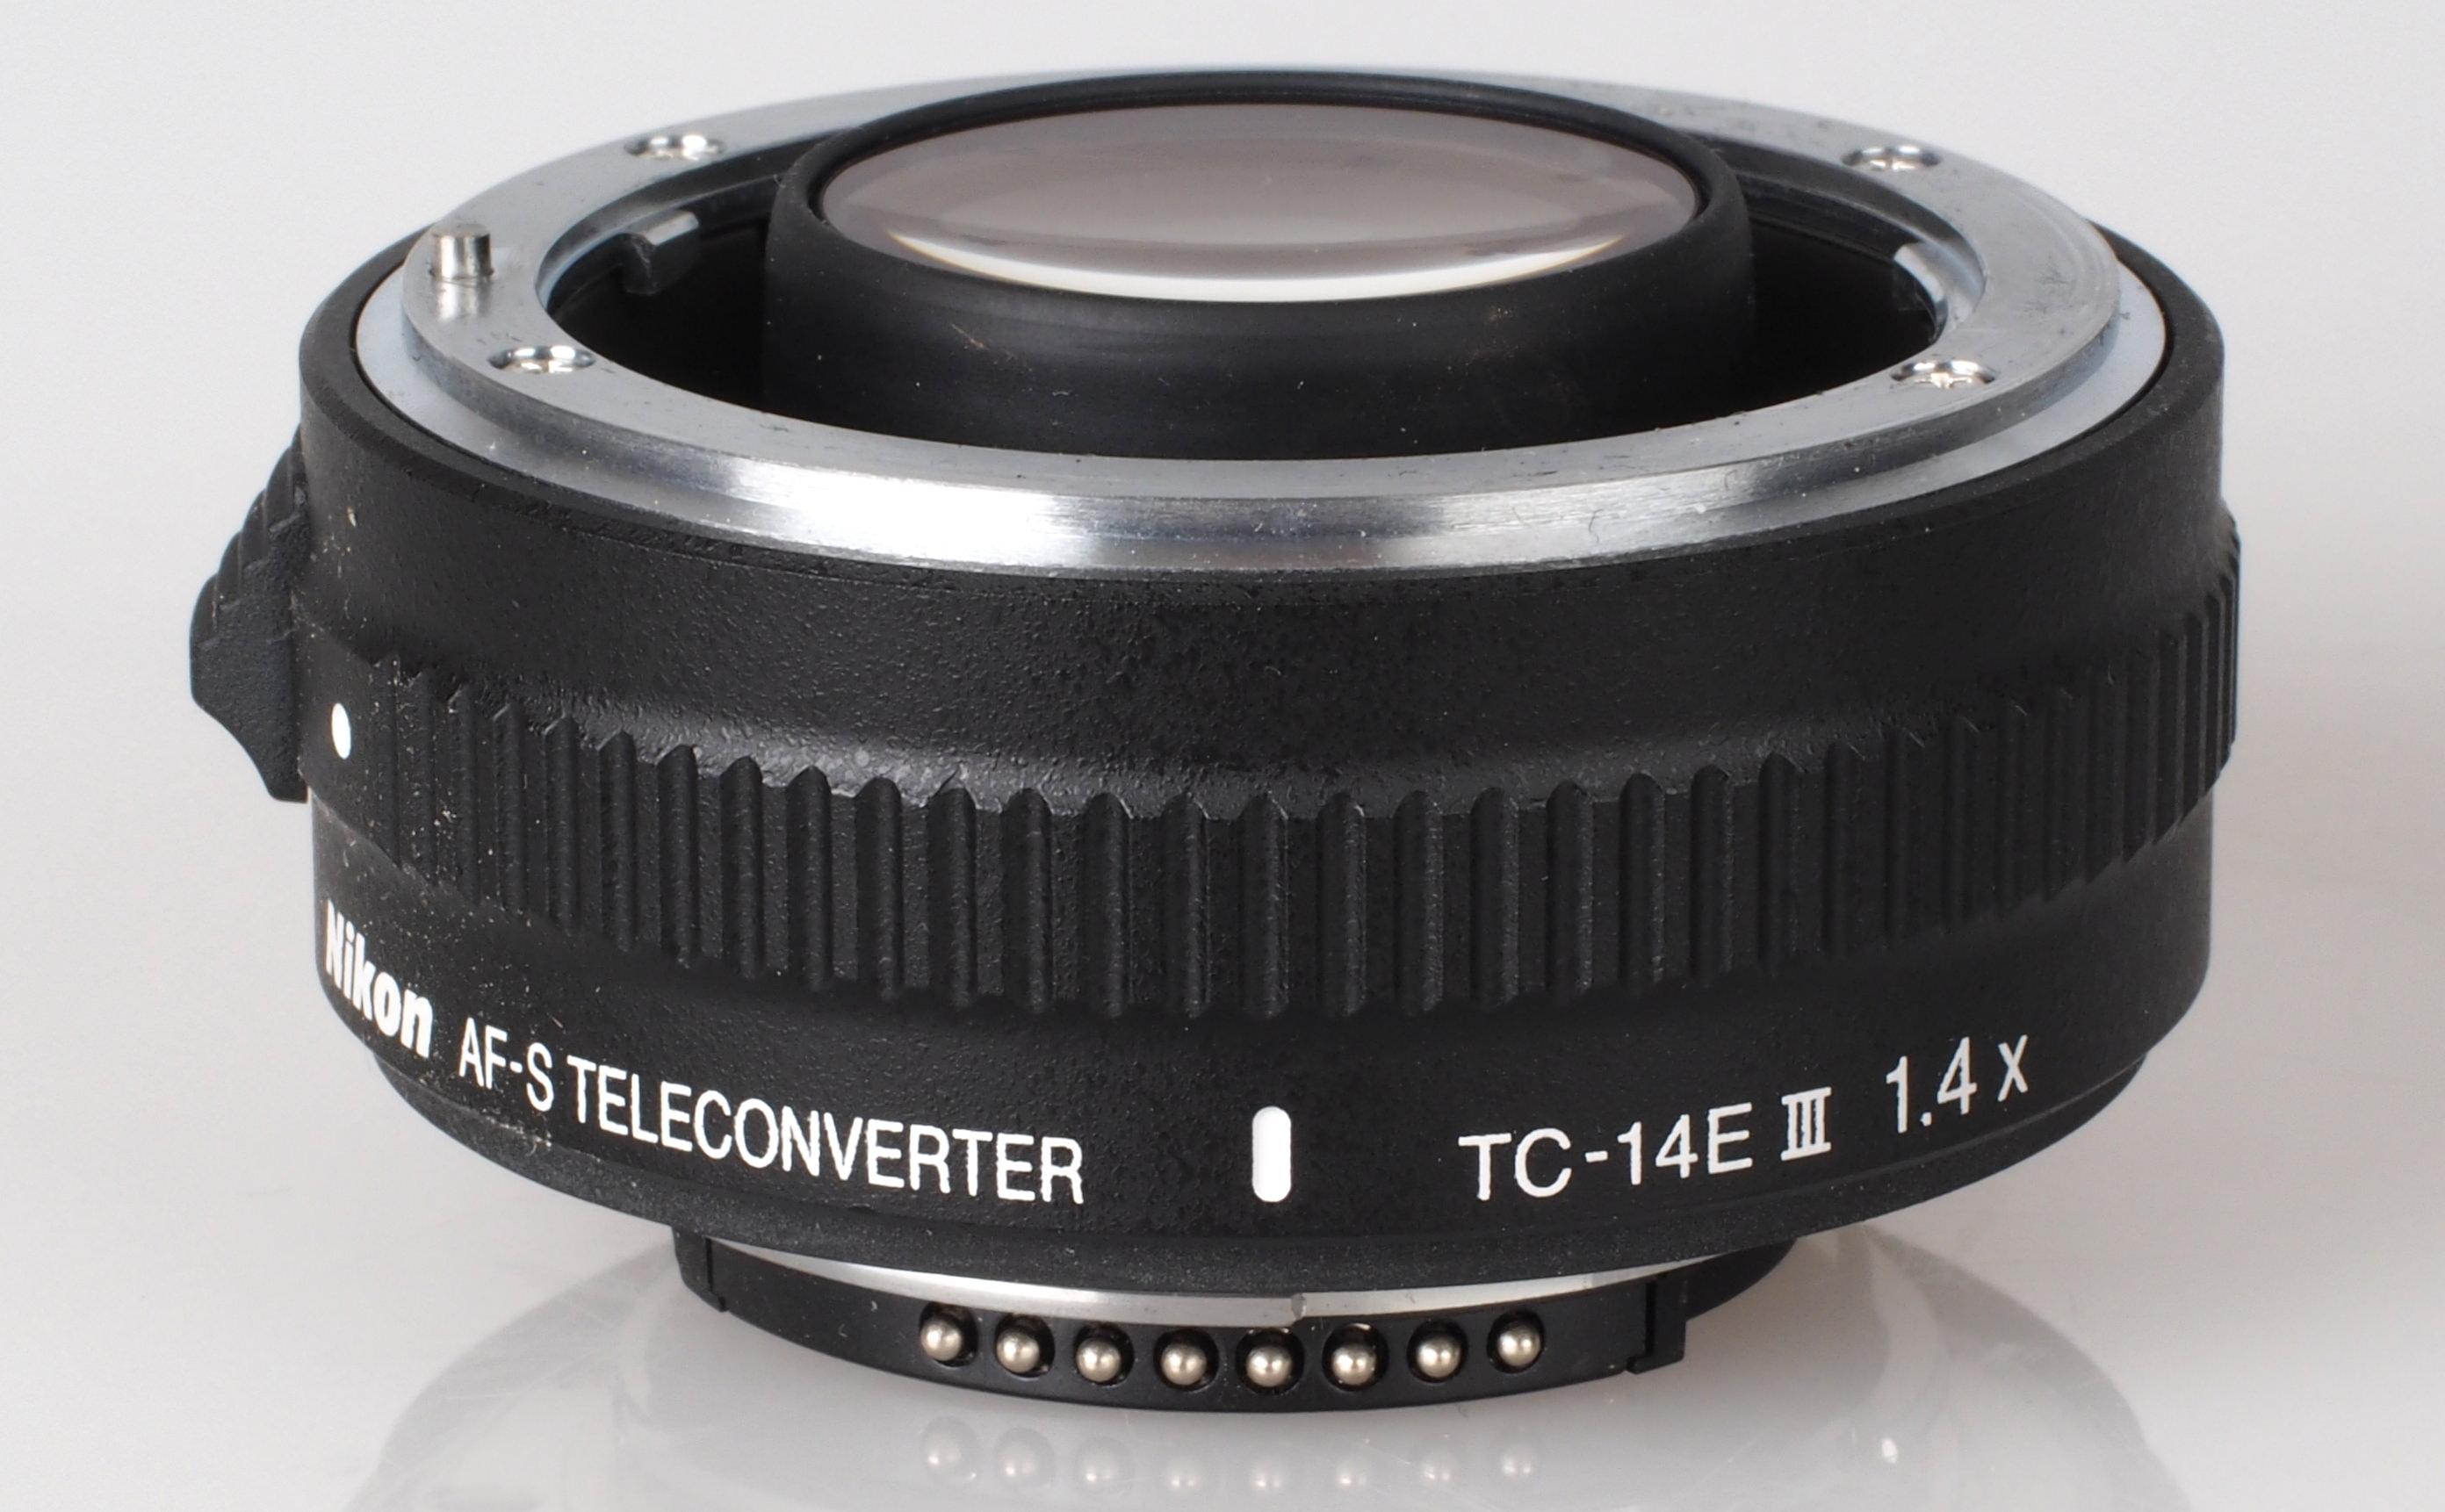 Nikon Afs Teleconverter Tc14e